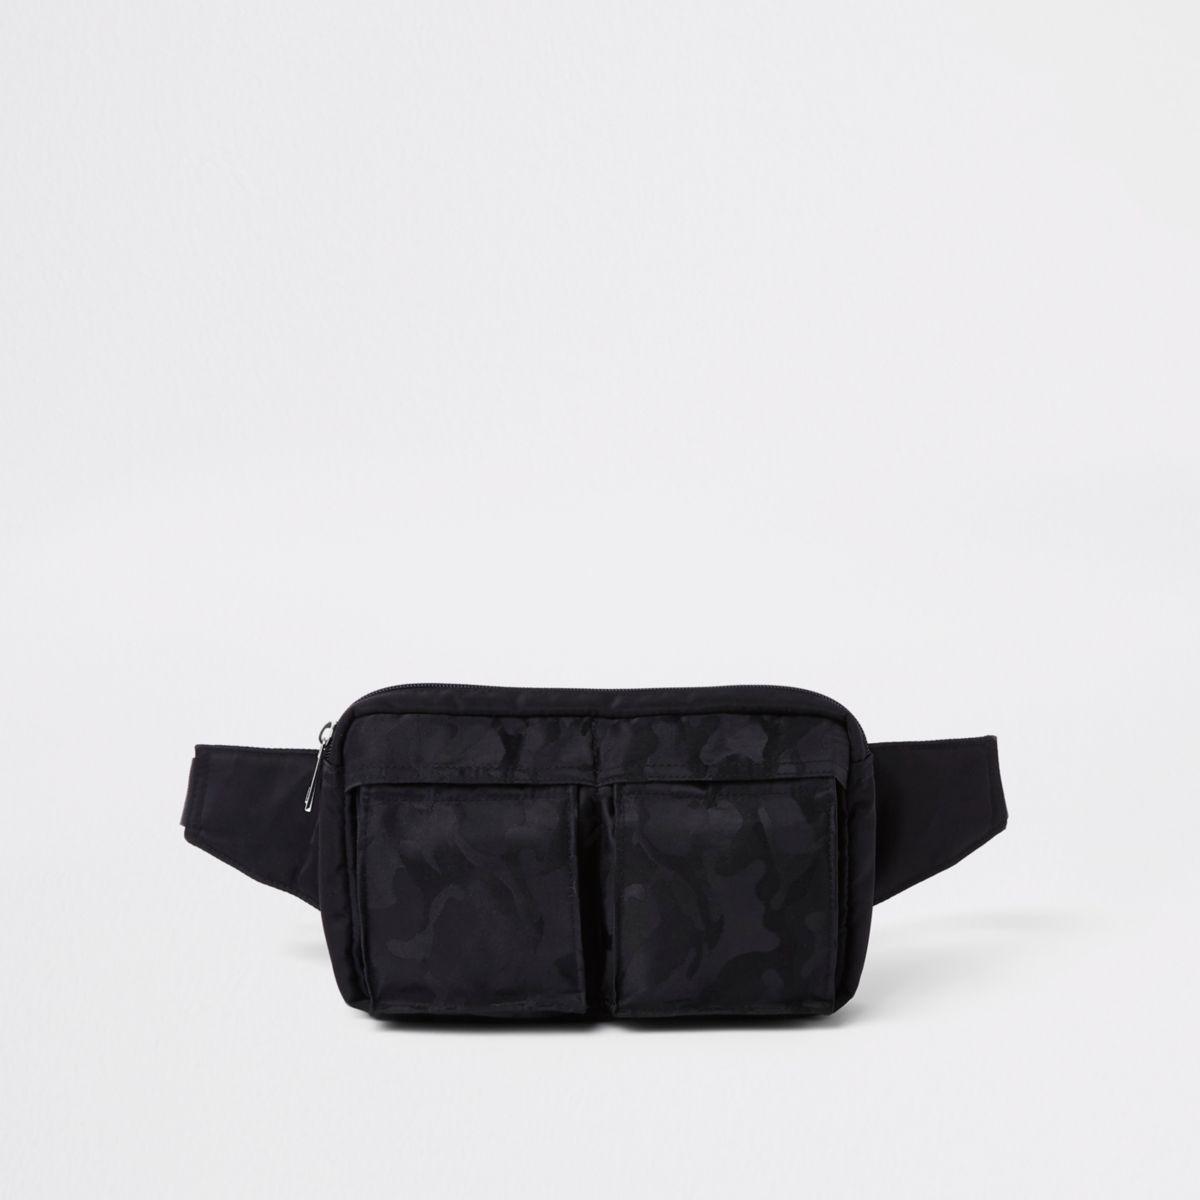 Black camo two pocket cross body bag